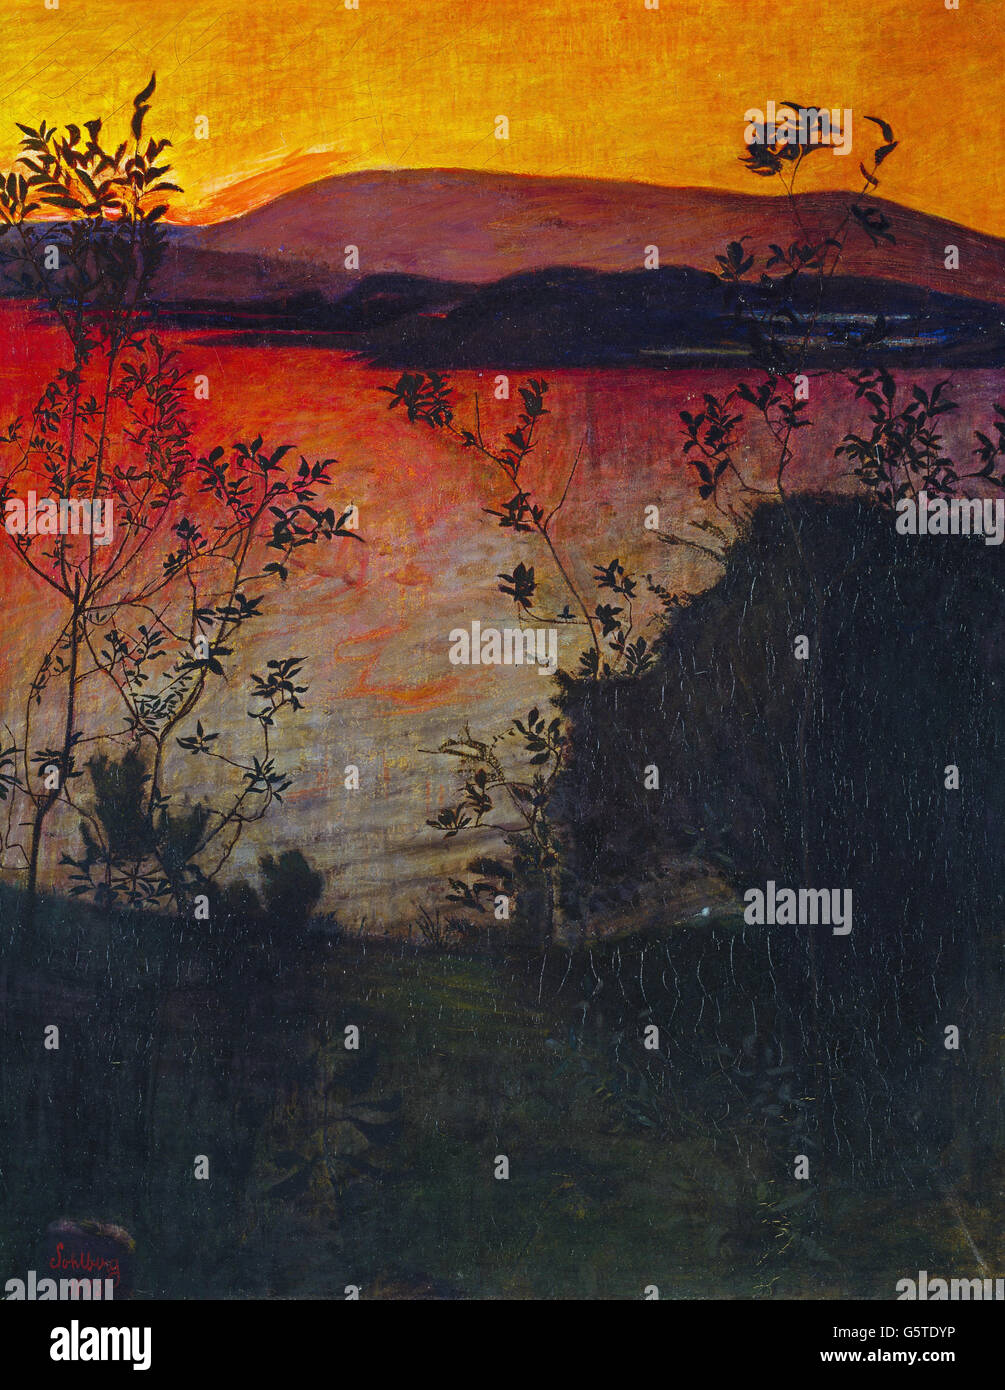 Harald Sohlberg - Evening Glow - Stock Image